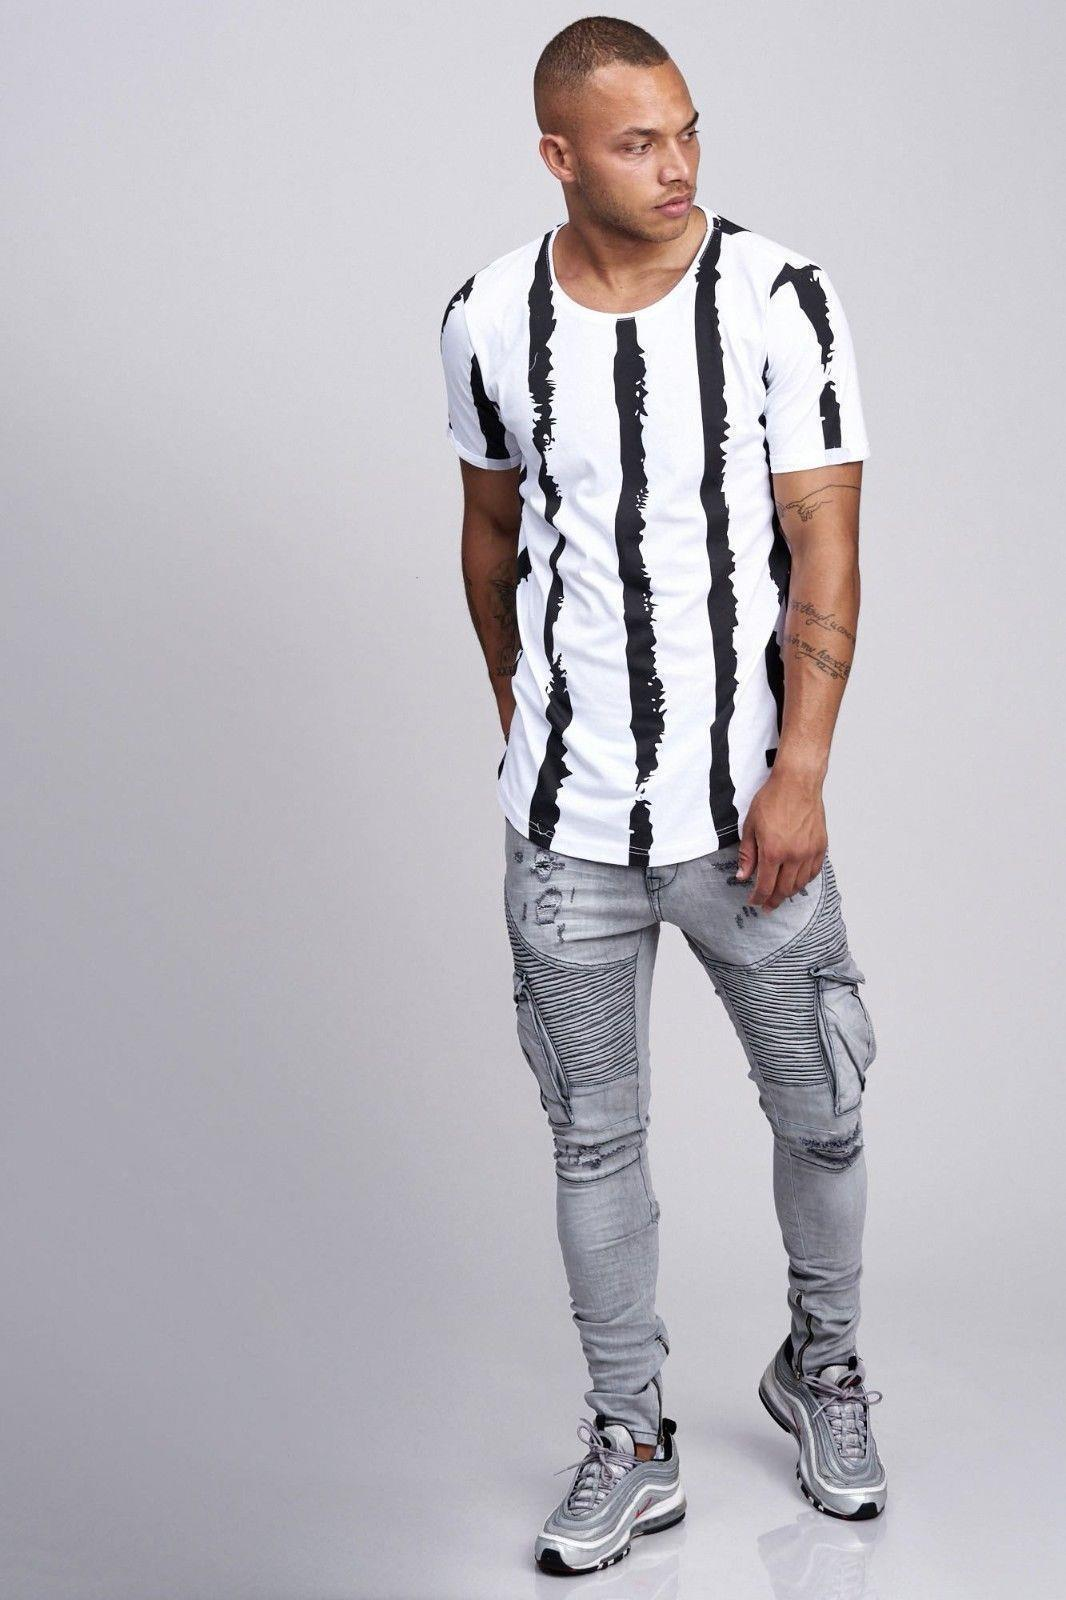 T-shirt-da-Uomo-Polo-Shirt-a-Maniche-Corte-printshirt-Polo-a-Maniche-Corte-17018-John-Kayna miniatura 5